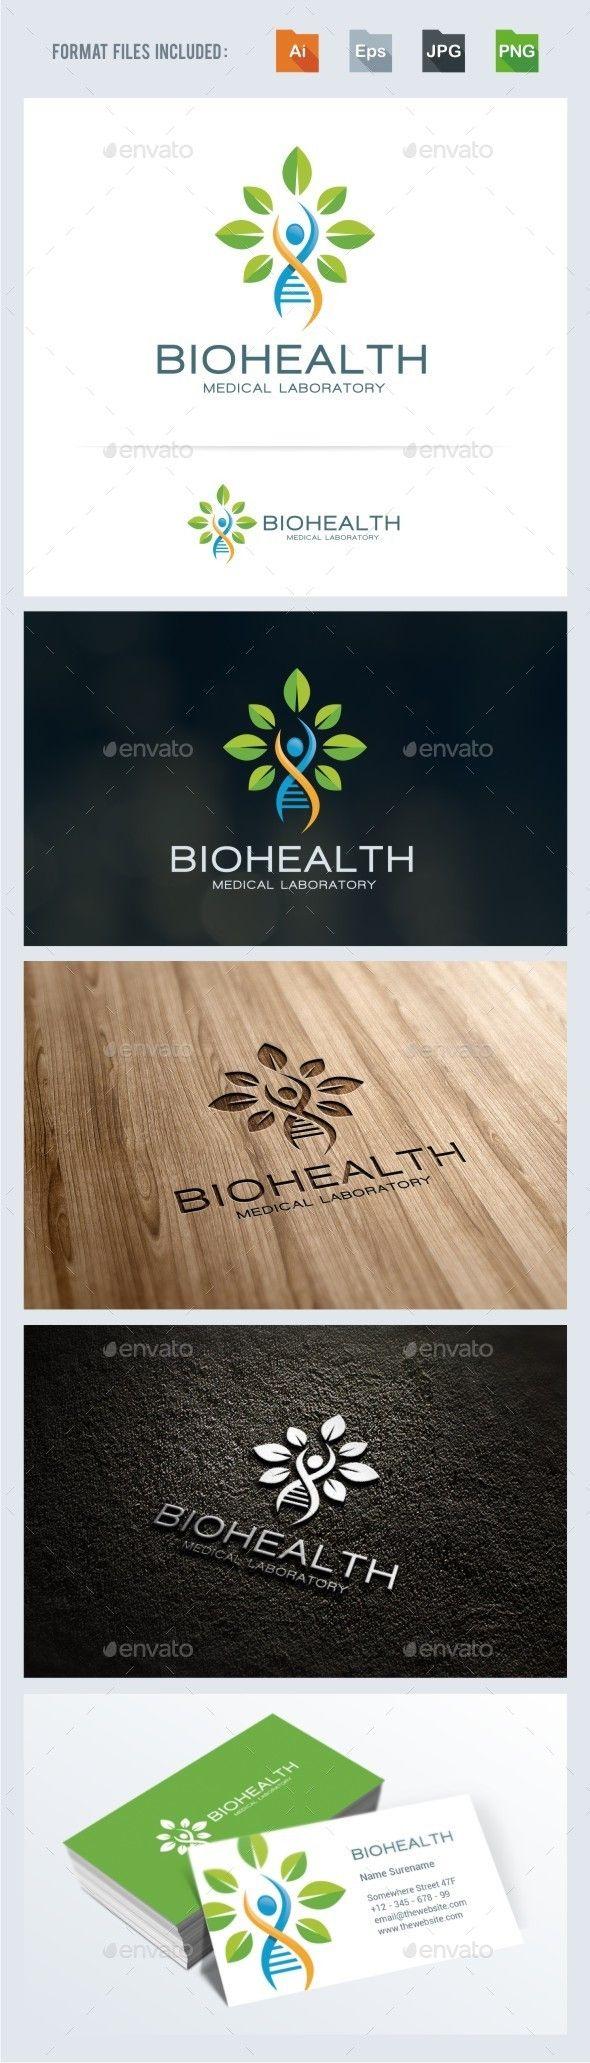 Bio Health Medical  - Logo Design Template Vector #logotype Download it here: http://graphicriver.net/item/bio-health-medical-logo-template/13402548?s_rank=1105?ref=nesto